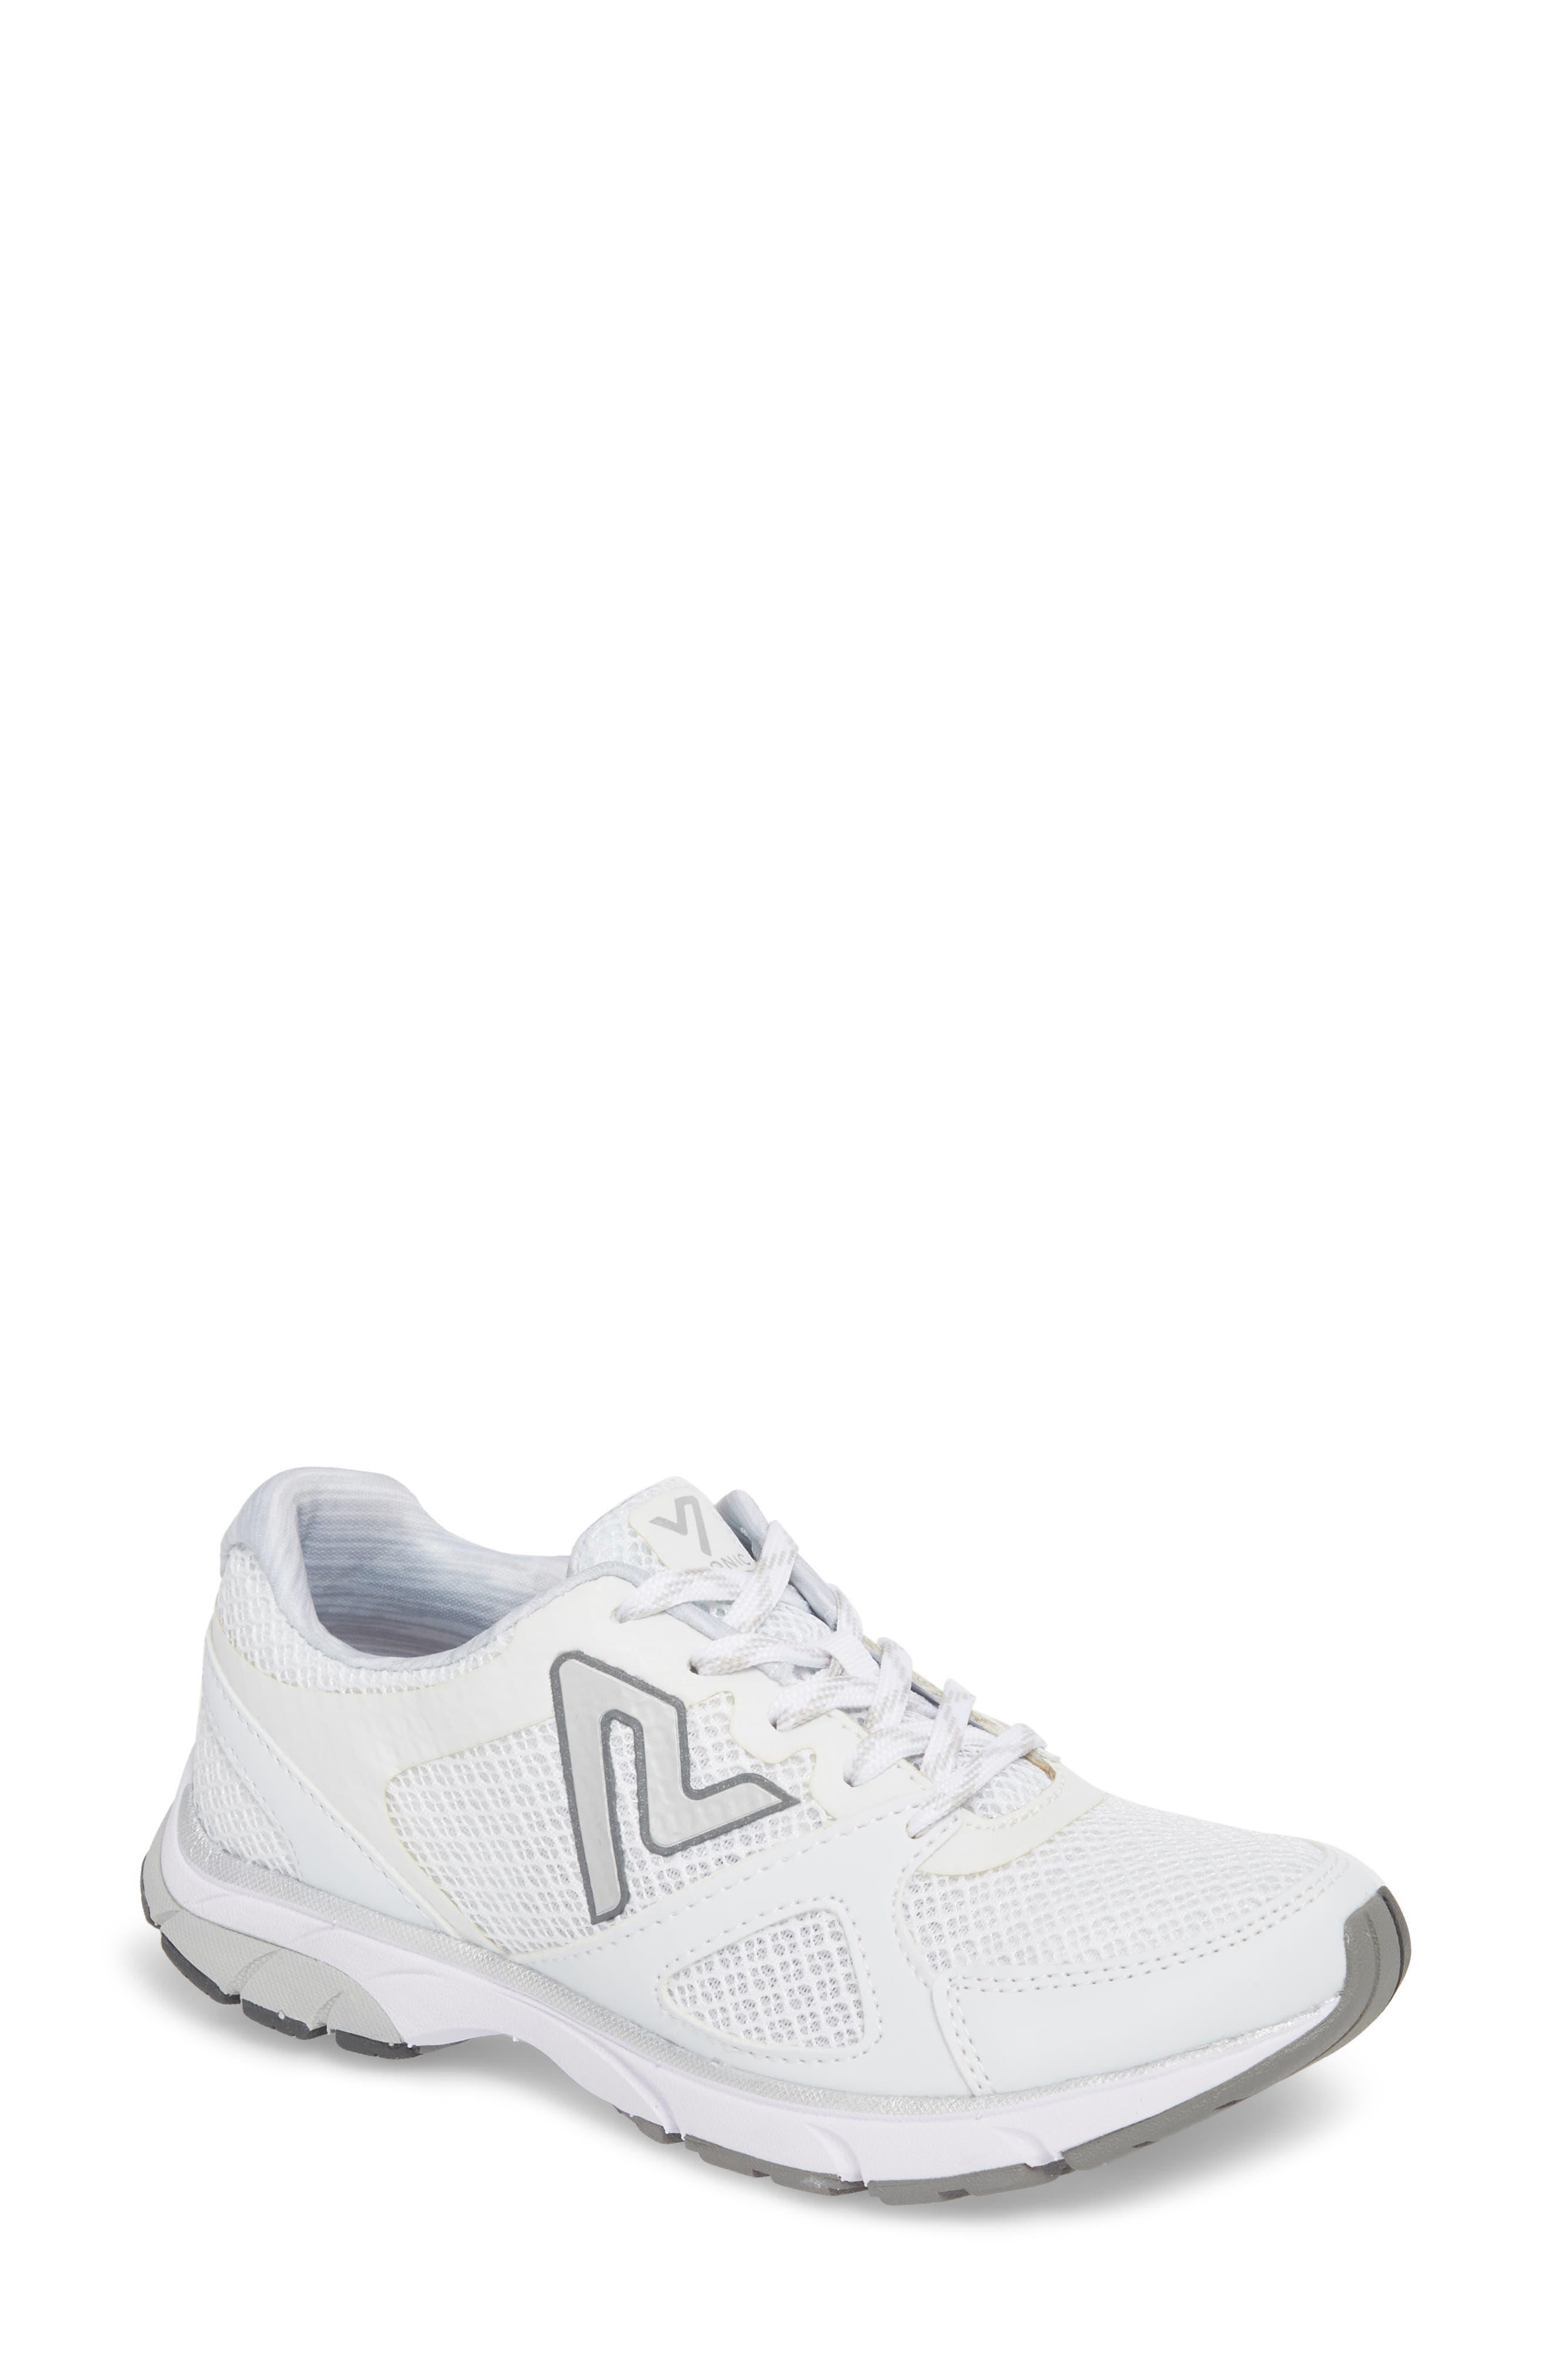 'Satima' Sneaker,                             Main thumbnail 1, color,                             WHITE FABRIC